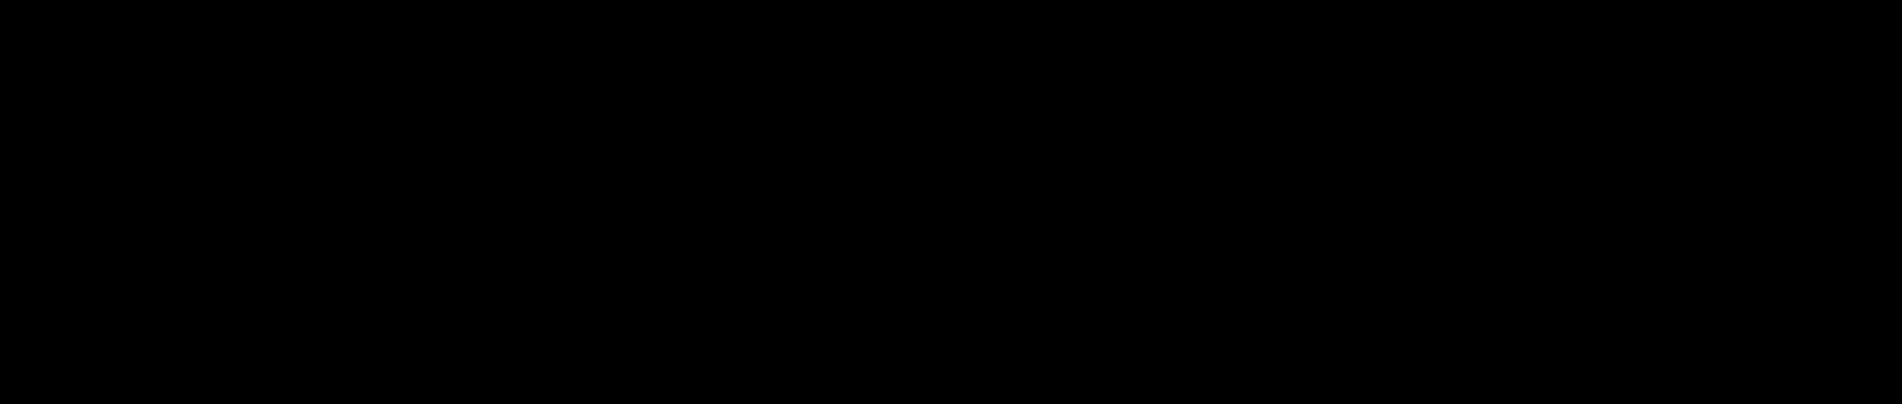 Rotman Wordmark Black